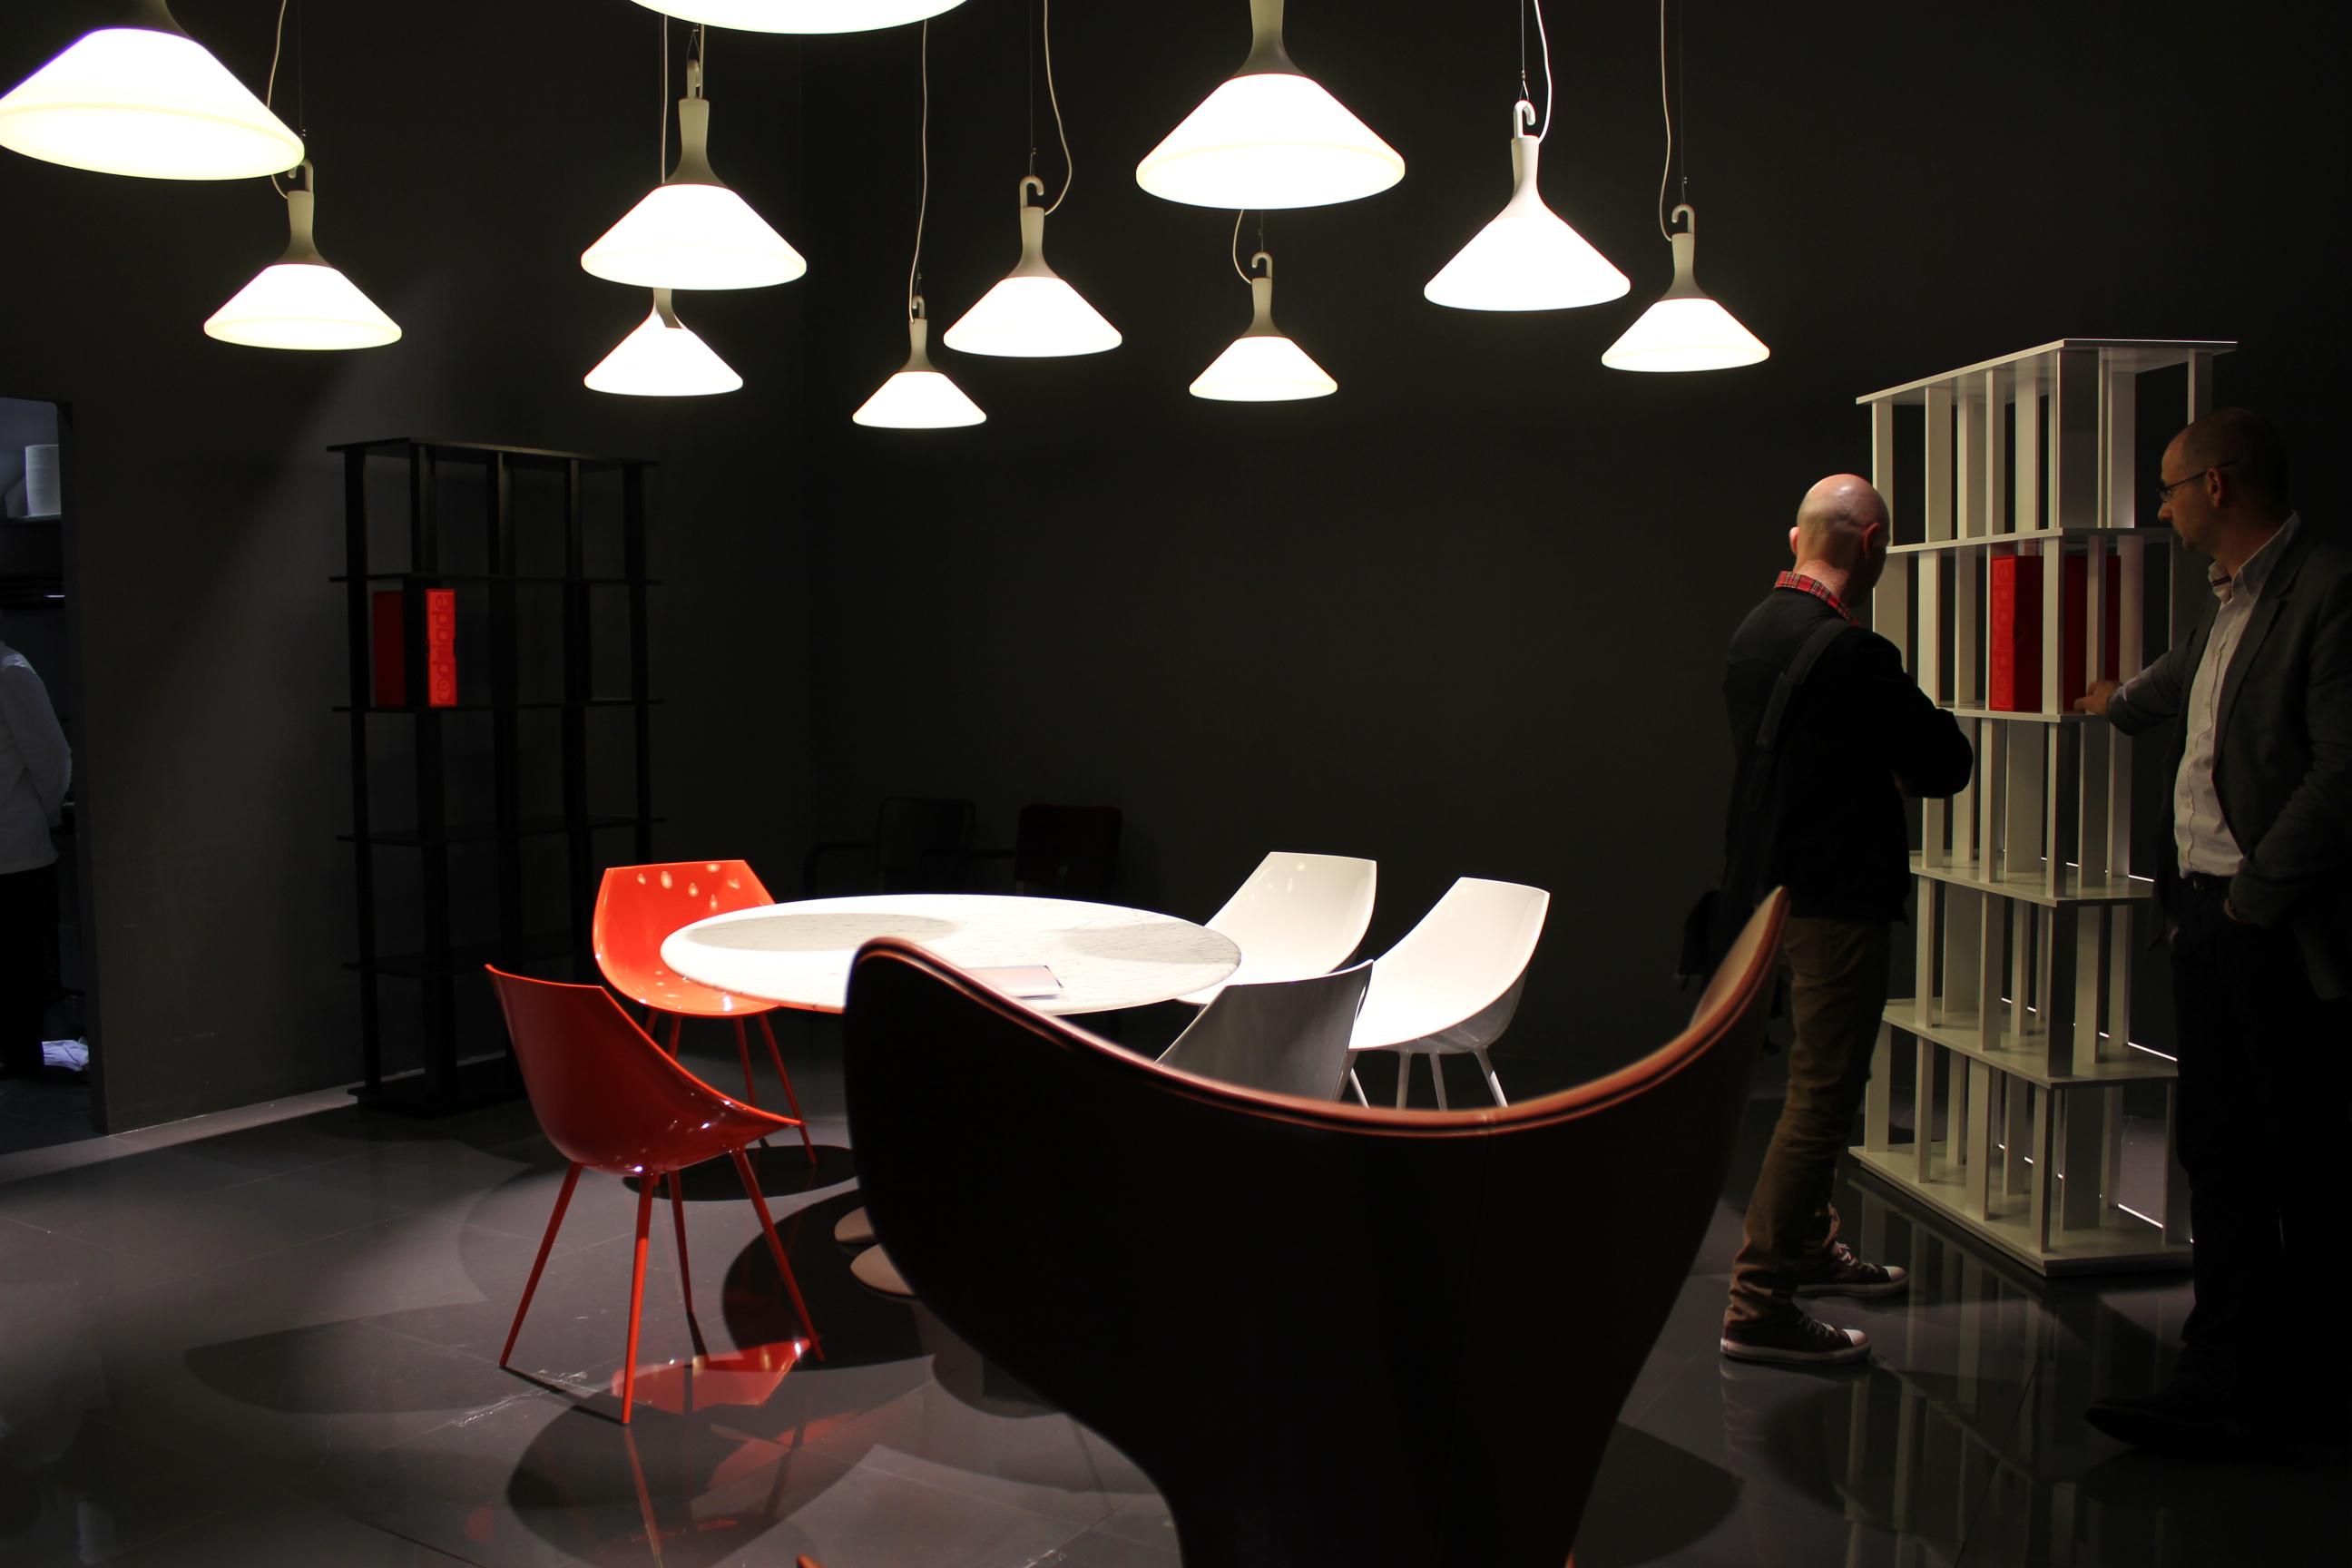 salon du meuble milan 2011 le blog objects by. Black Bedroom Furniture Sets. Home Design Ideas